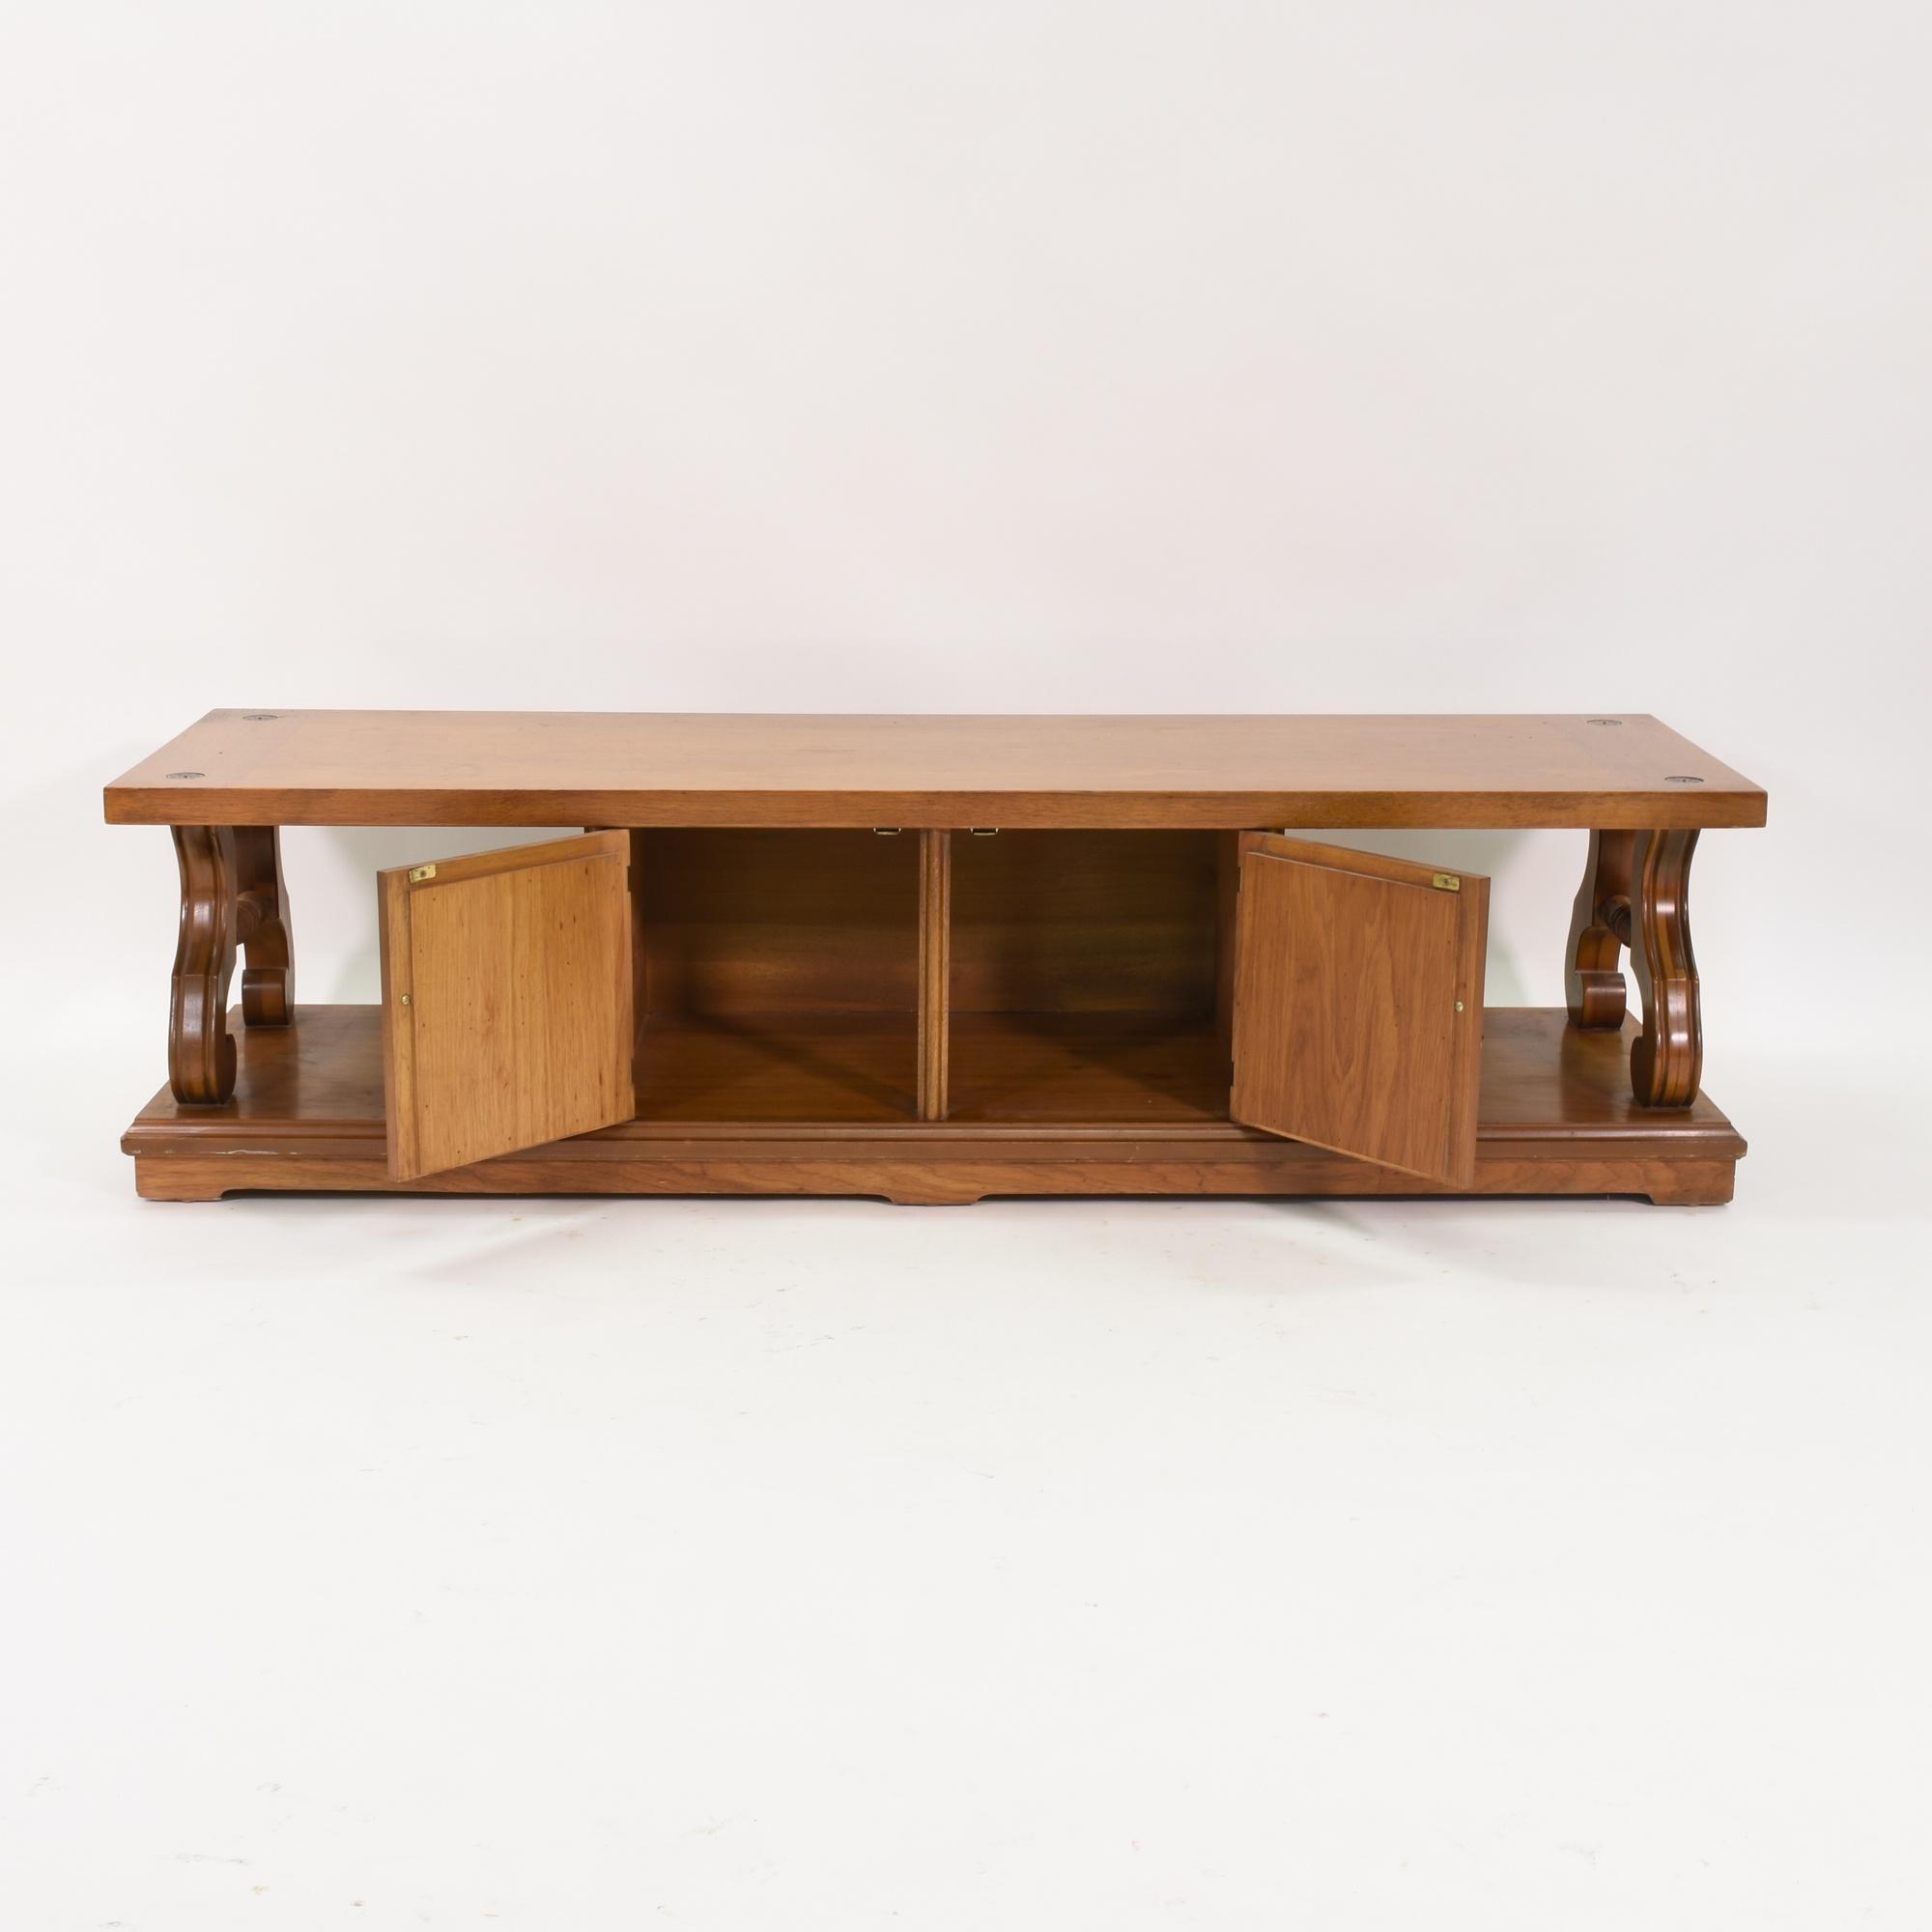 Retro Coffee Table W Two Doors In Solid Wood Loveseat Vintage Furniture San Diego Los Angeles